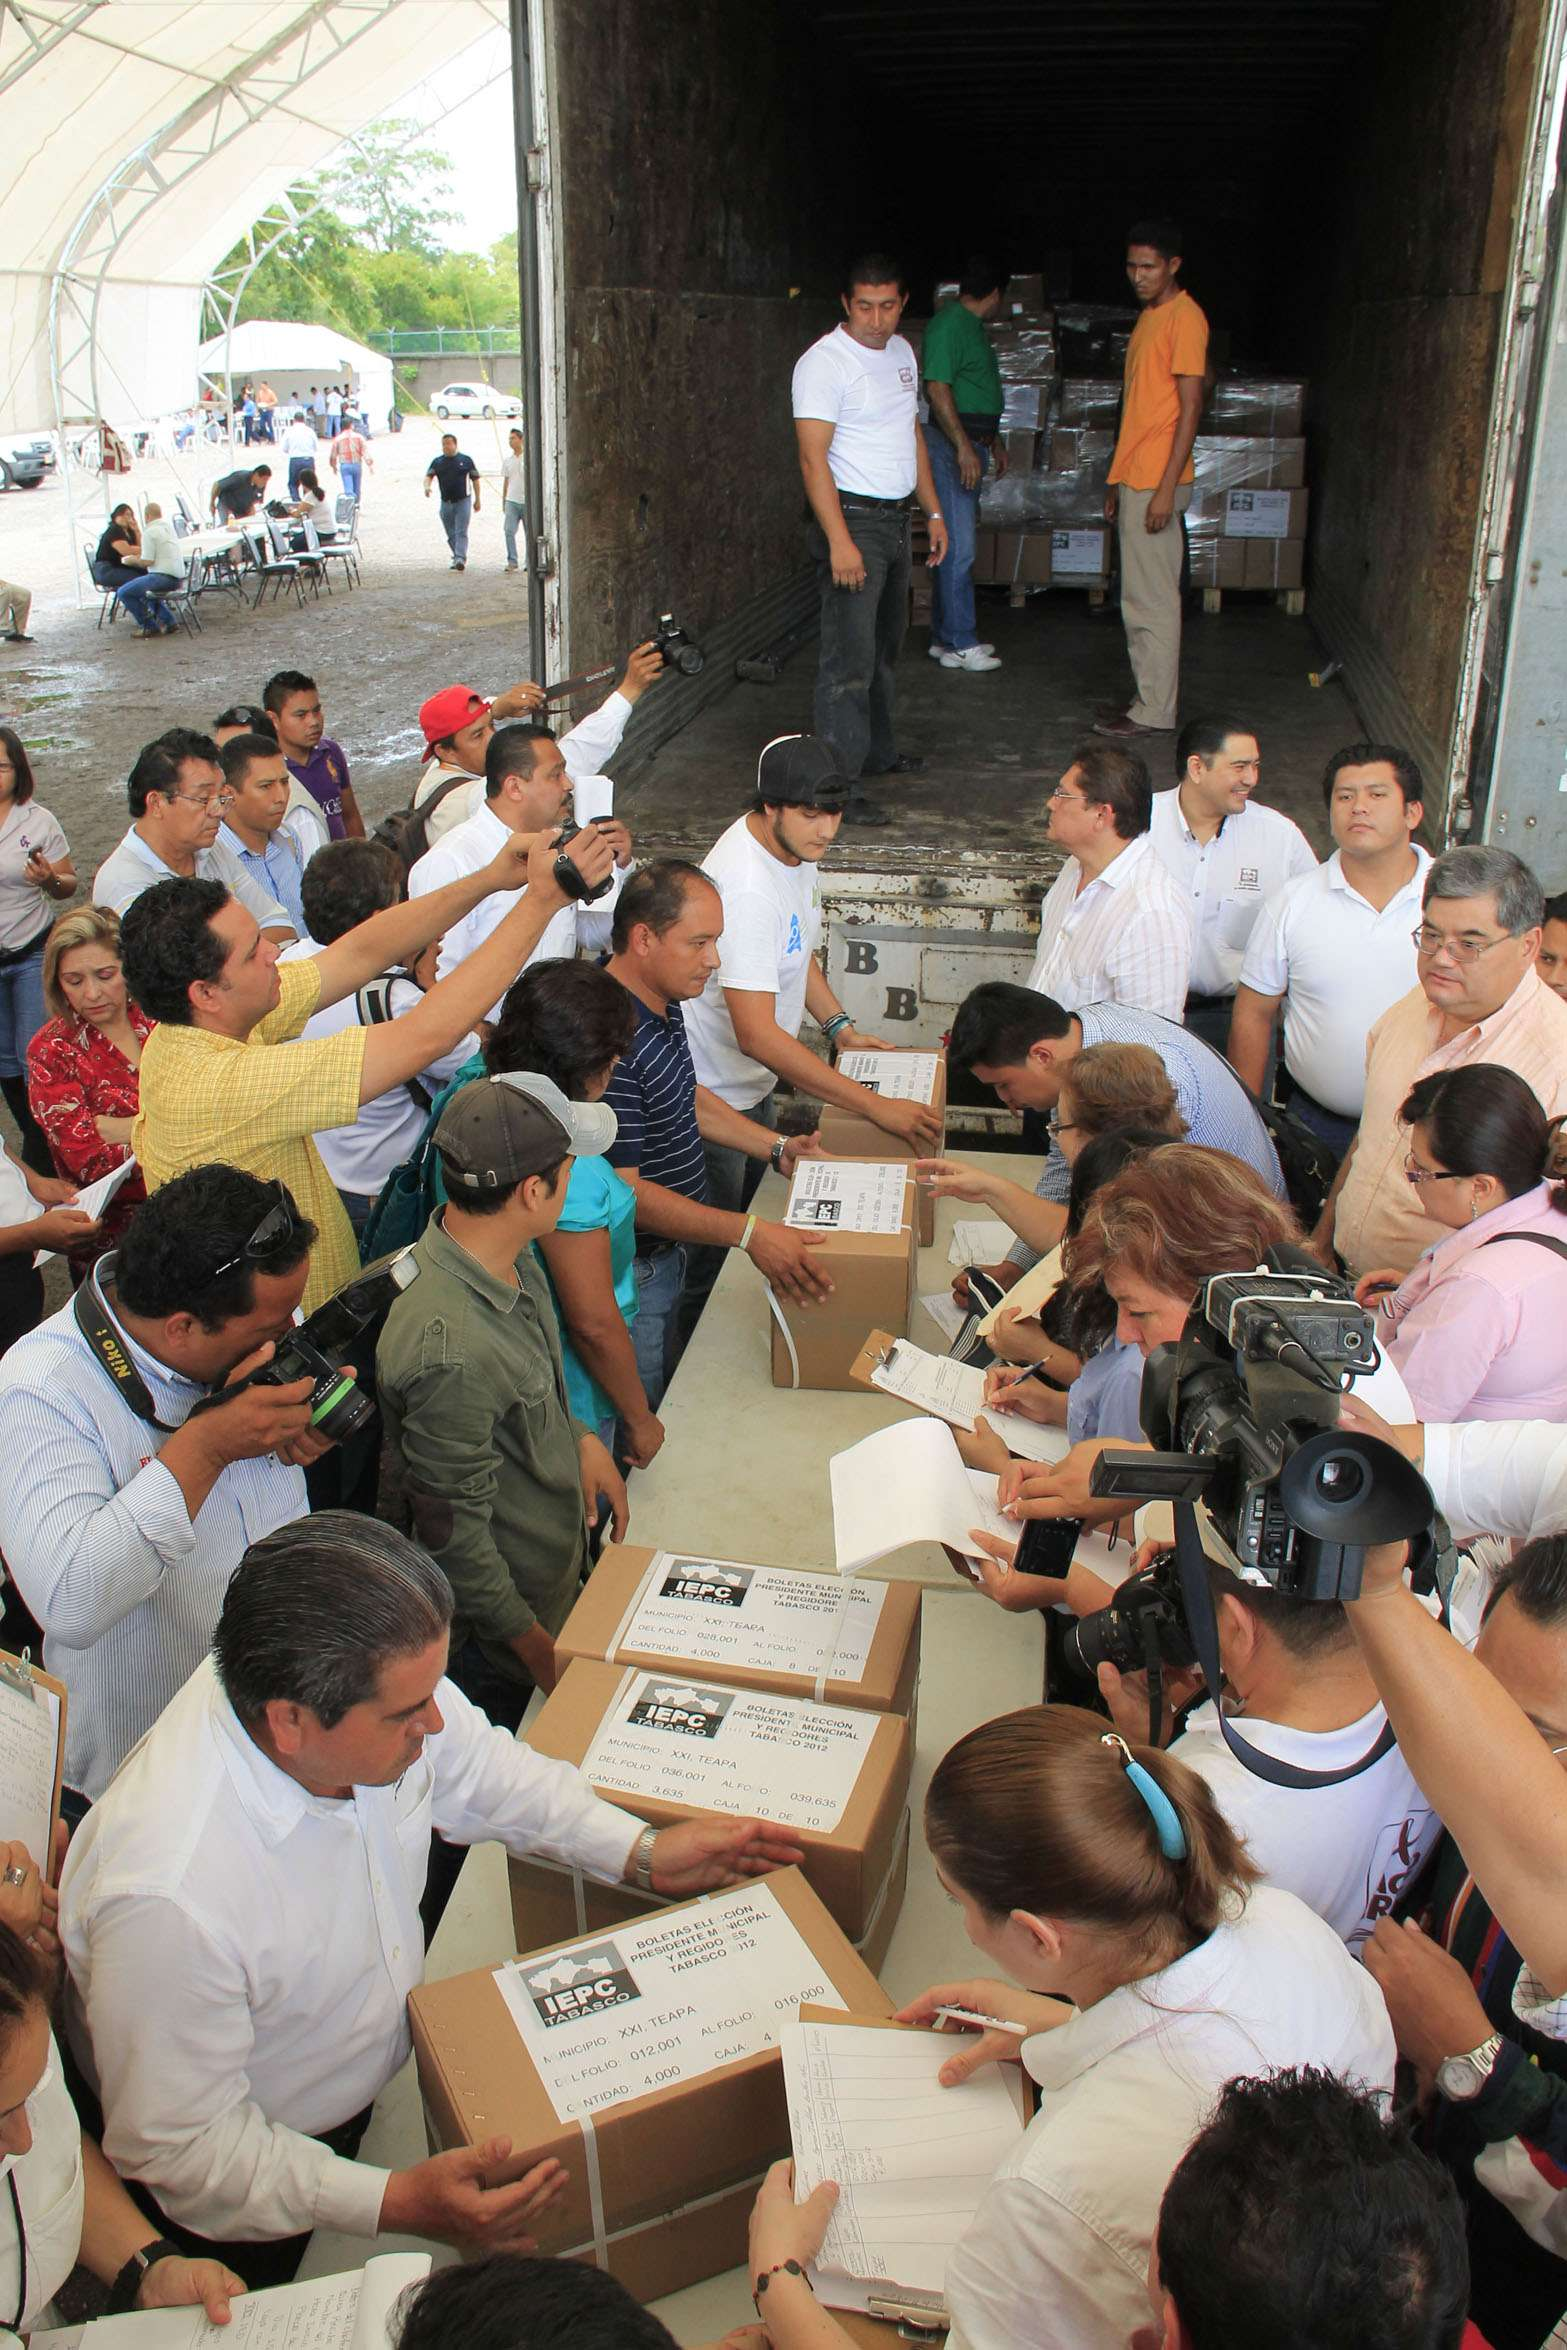 Alcalde de Tabasco reporta violencia en municipios